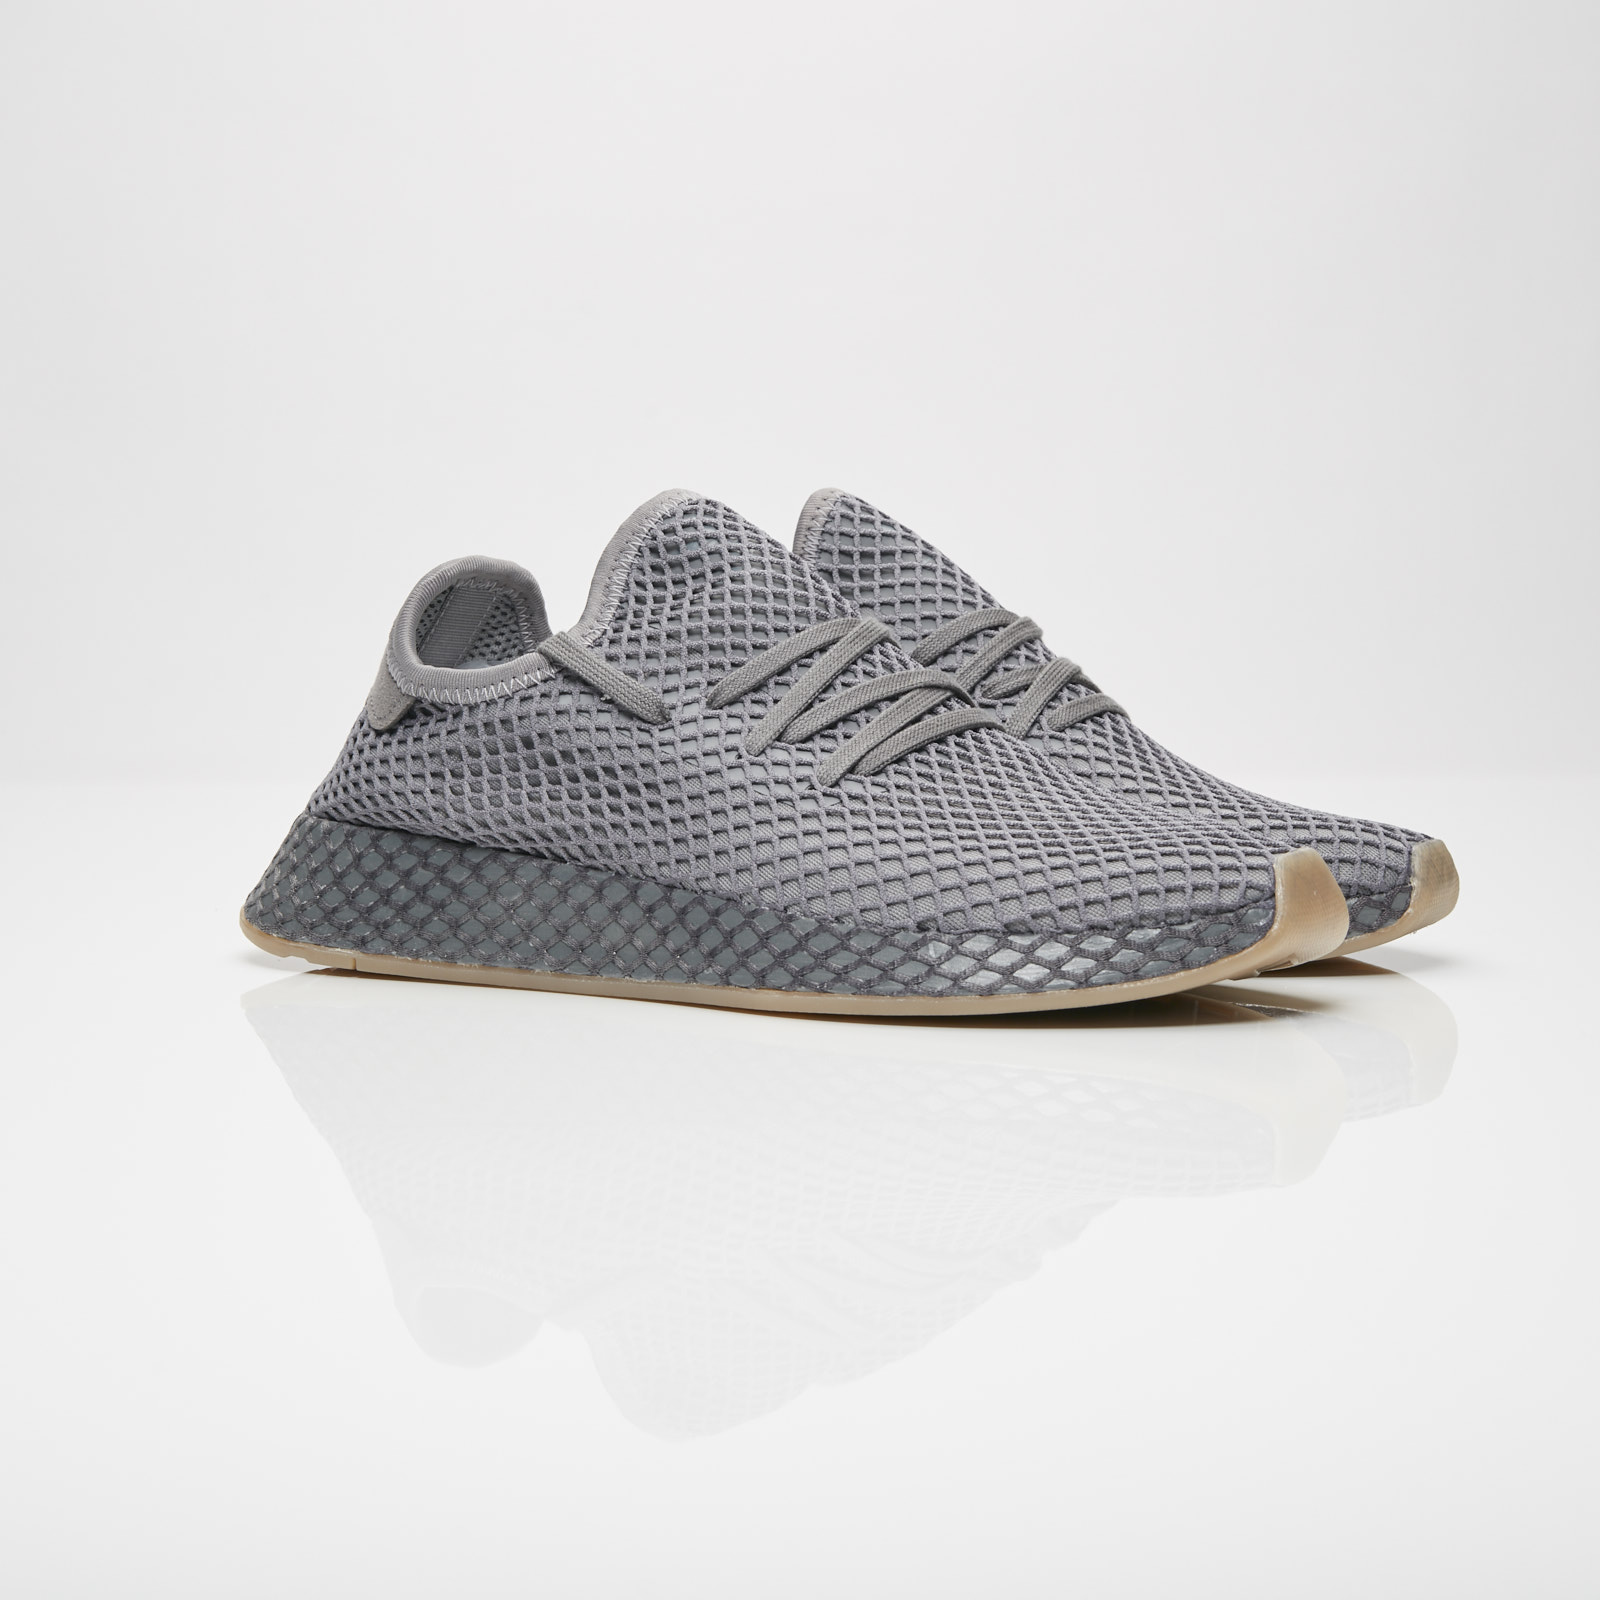 28c2ae4d2ce adidas Deerupt Runner - Cq2627 - Sneakersnstuff